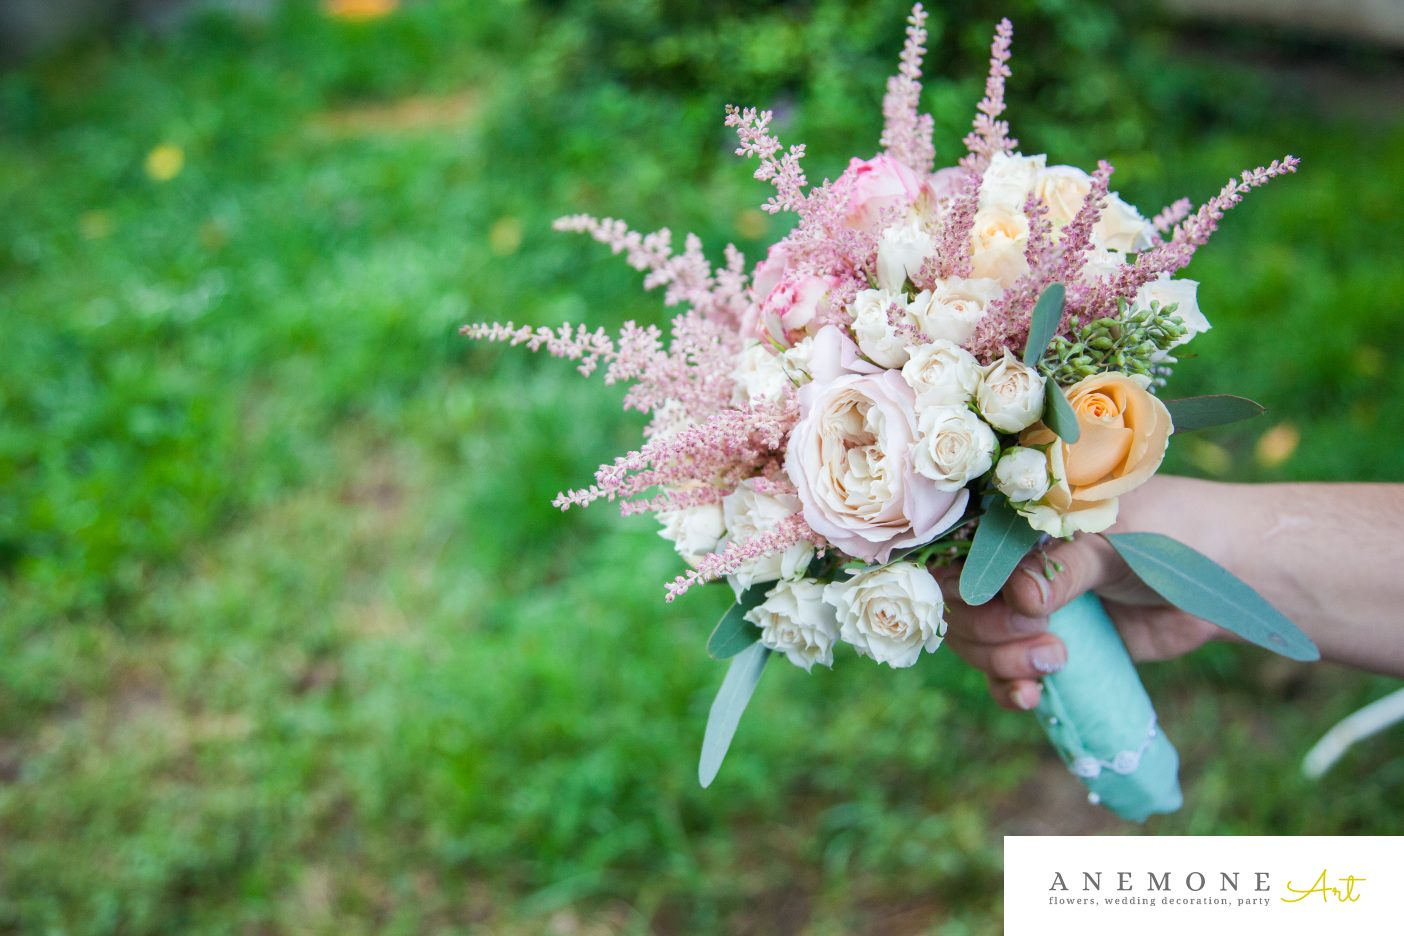 Poza, foto cu Flori de nunta astilbe, buchet cununie, crem, legat, pastel, rotund, roz, trandafiri, verde mint in Arad, Timisoara, Oradea (wedding flowers, bouquets) nunta Arad, Timisoara, Oradea